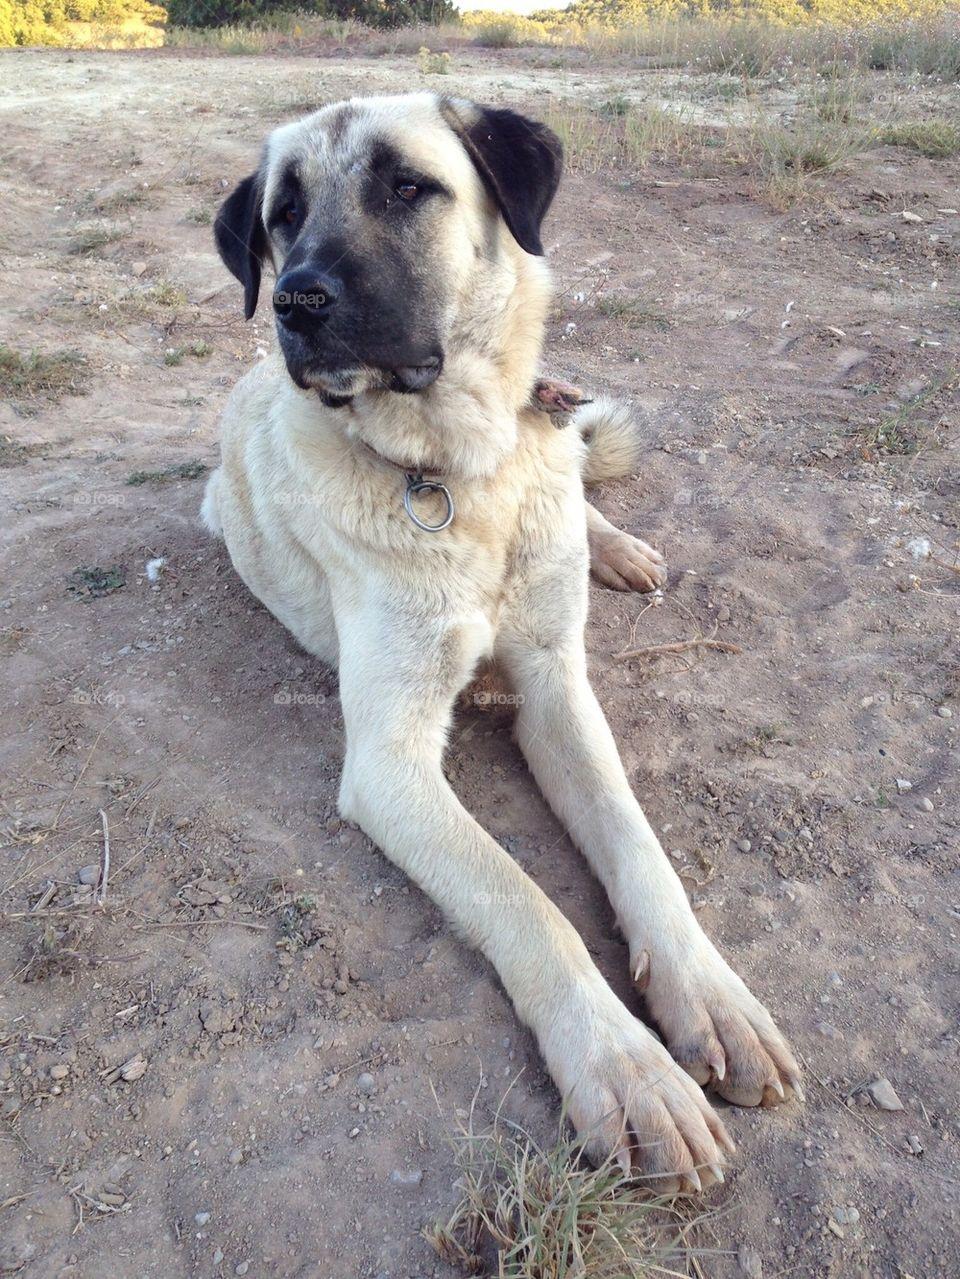 Foap com: Sivas Kangal Dog stock photo by kangalmaster